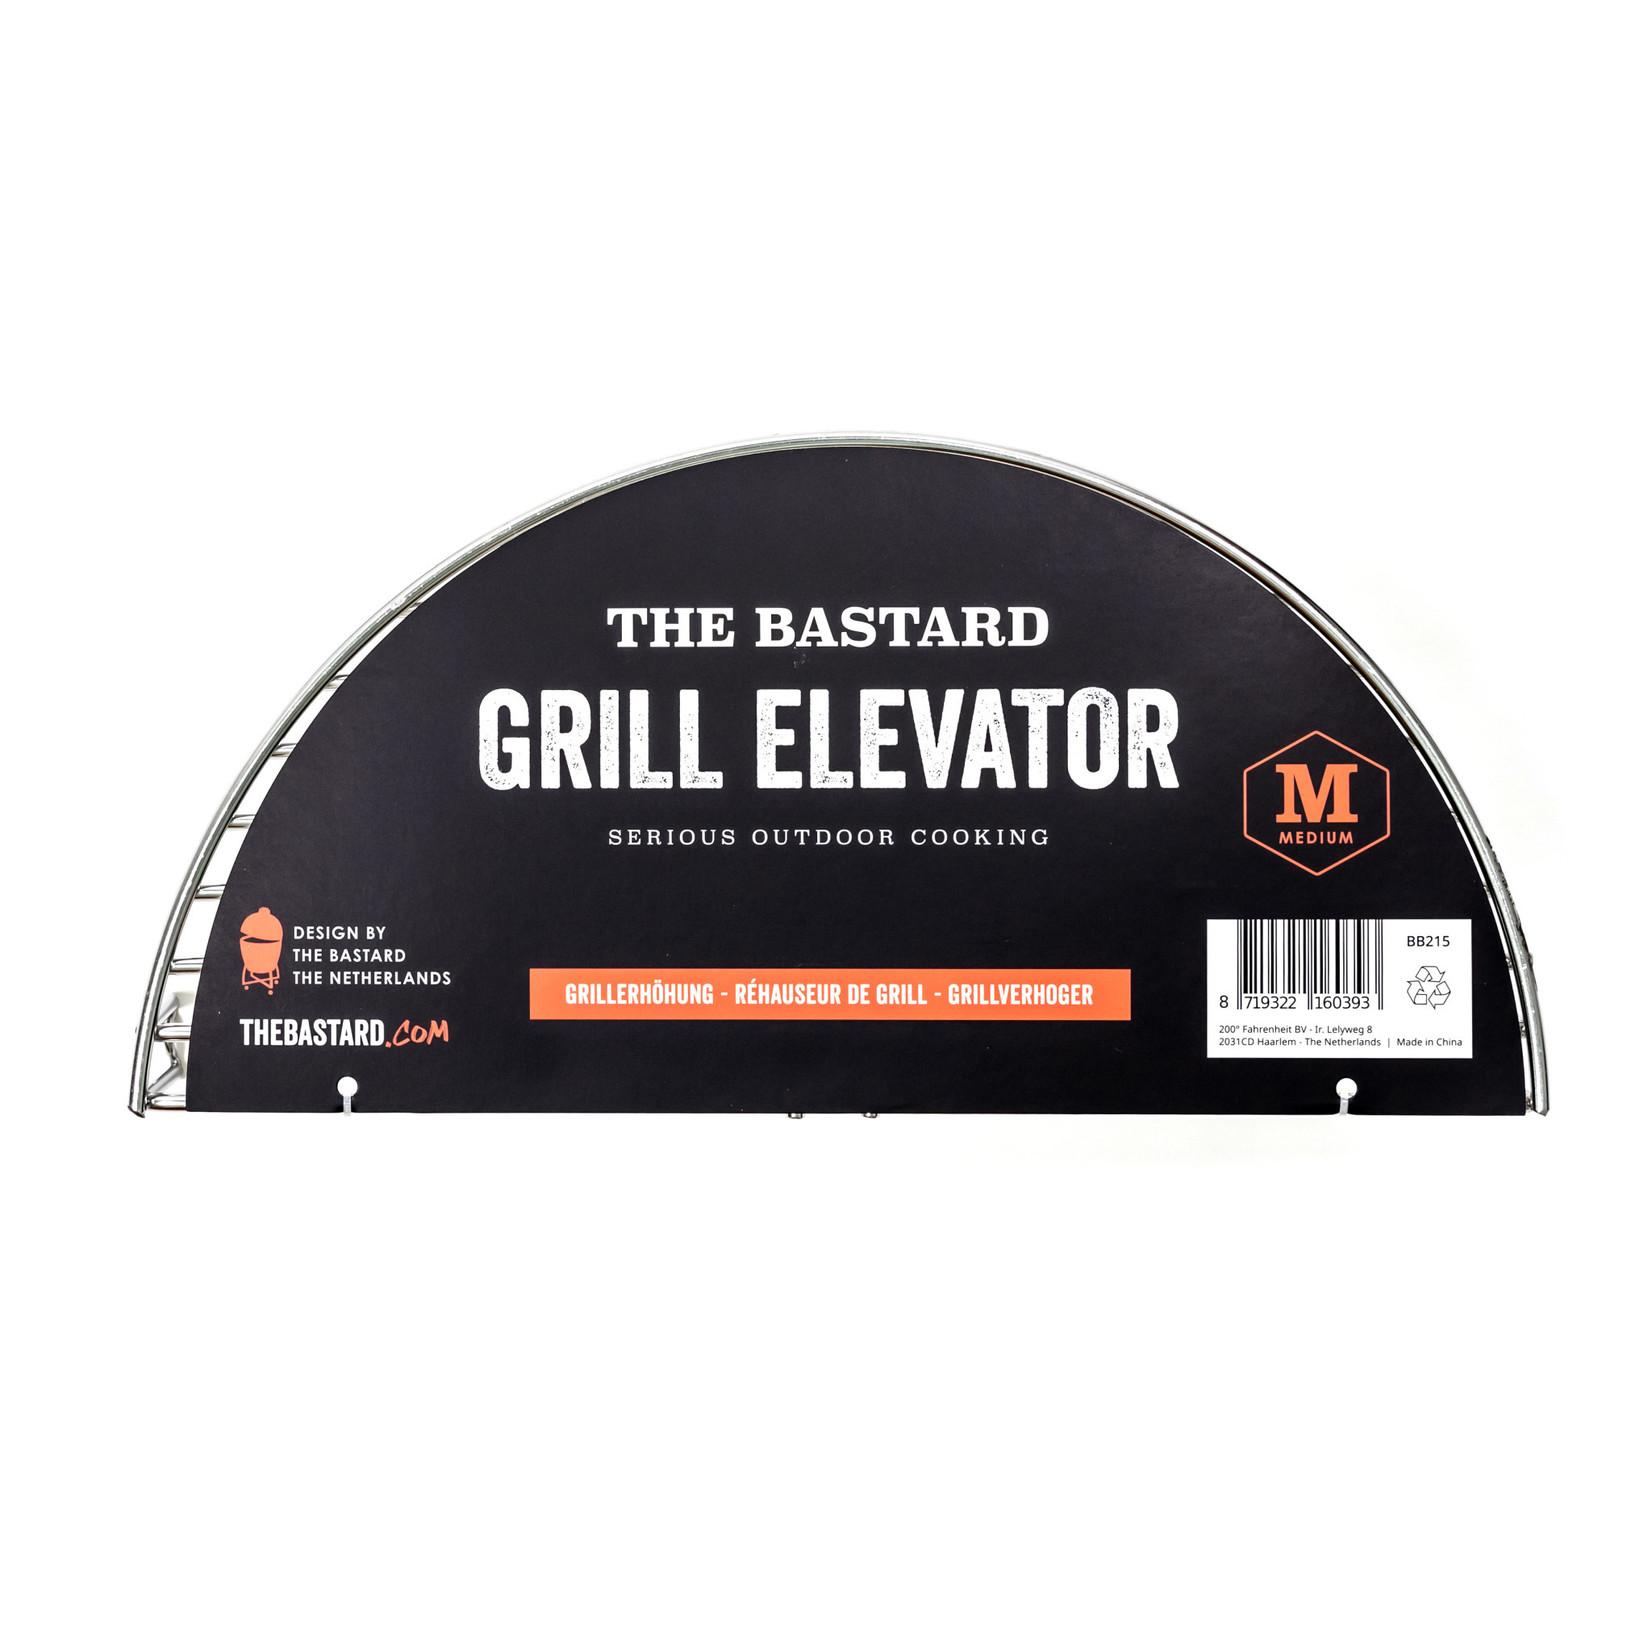 The Bastard The Bastard Grill Elevator